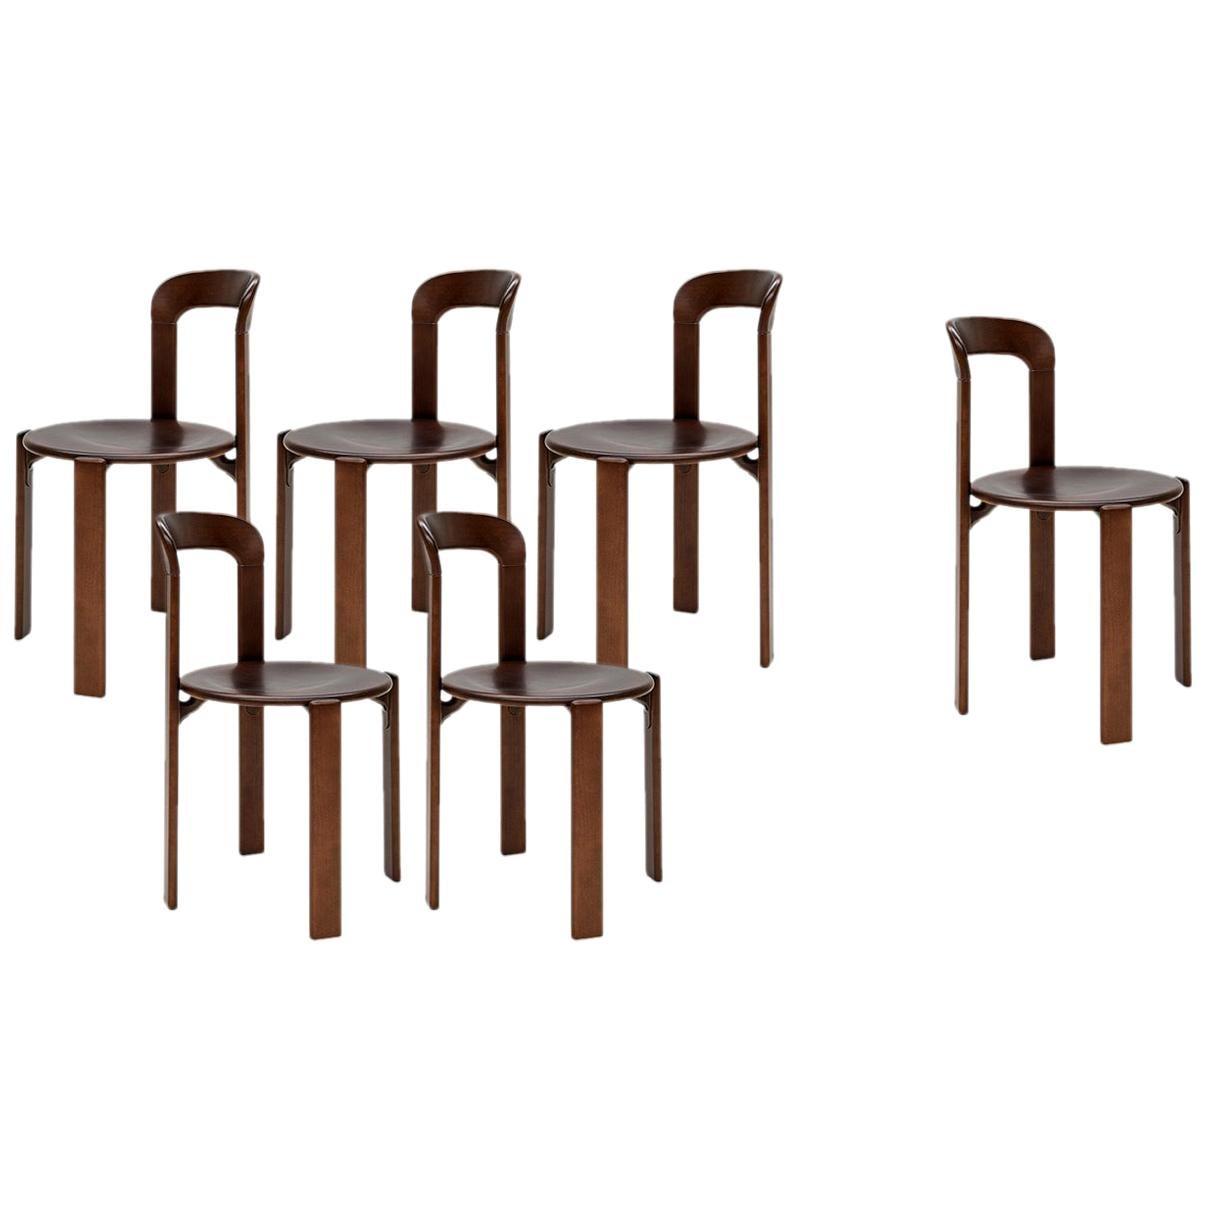 Mid-Century Modern, 6 Rey Chairs by Bruno Rey, Color Vintage Walnut, Design 1971